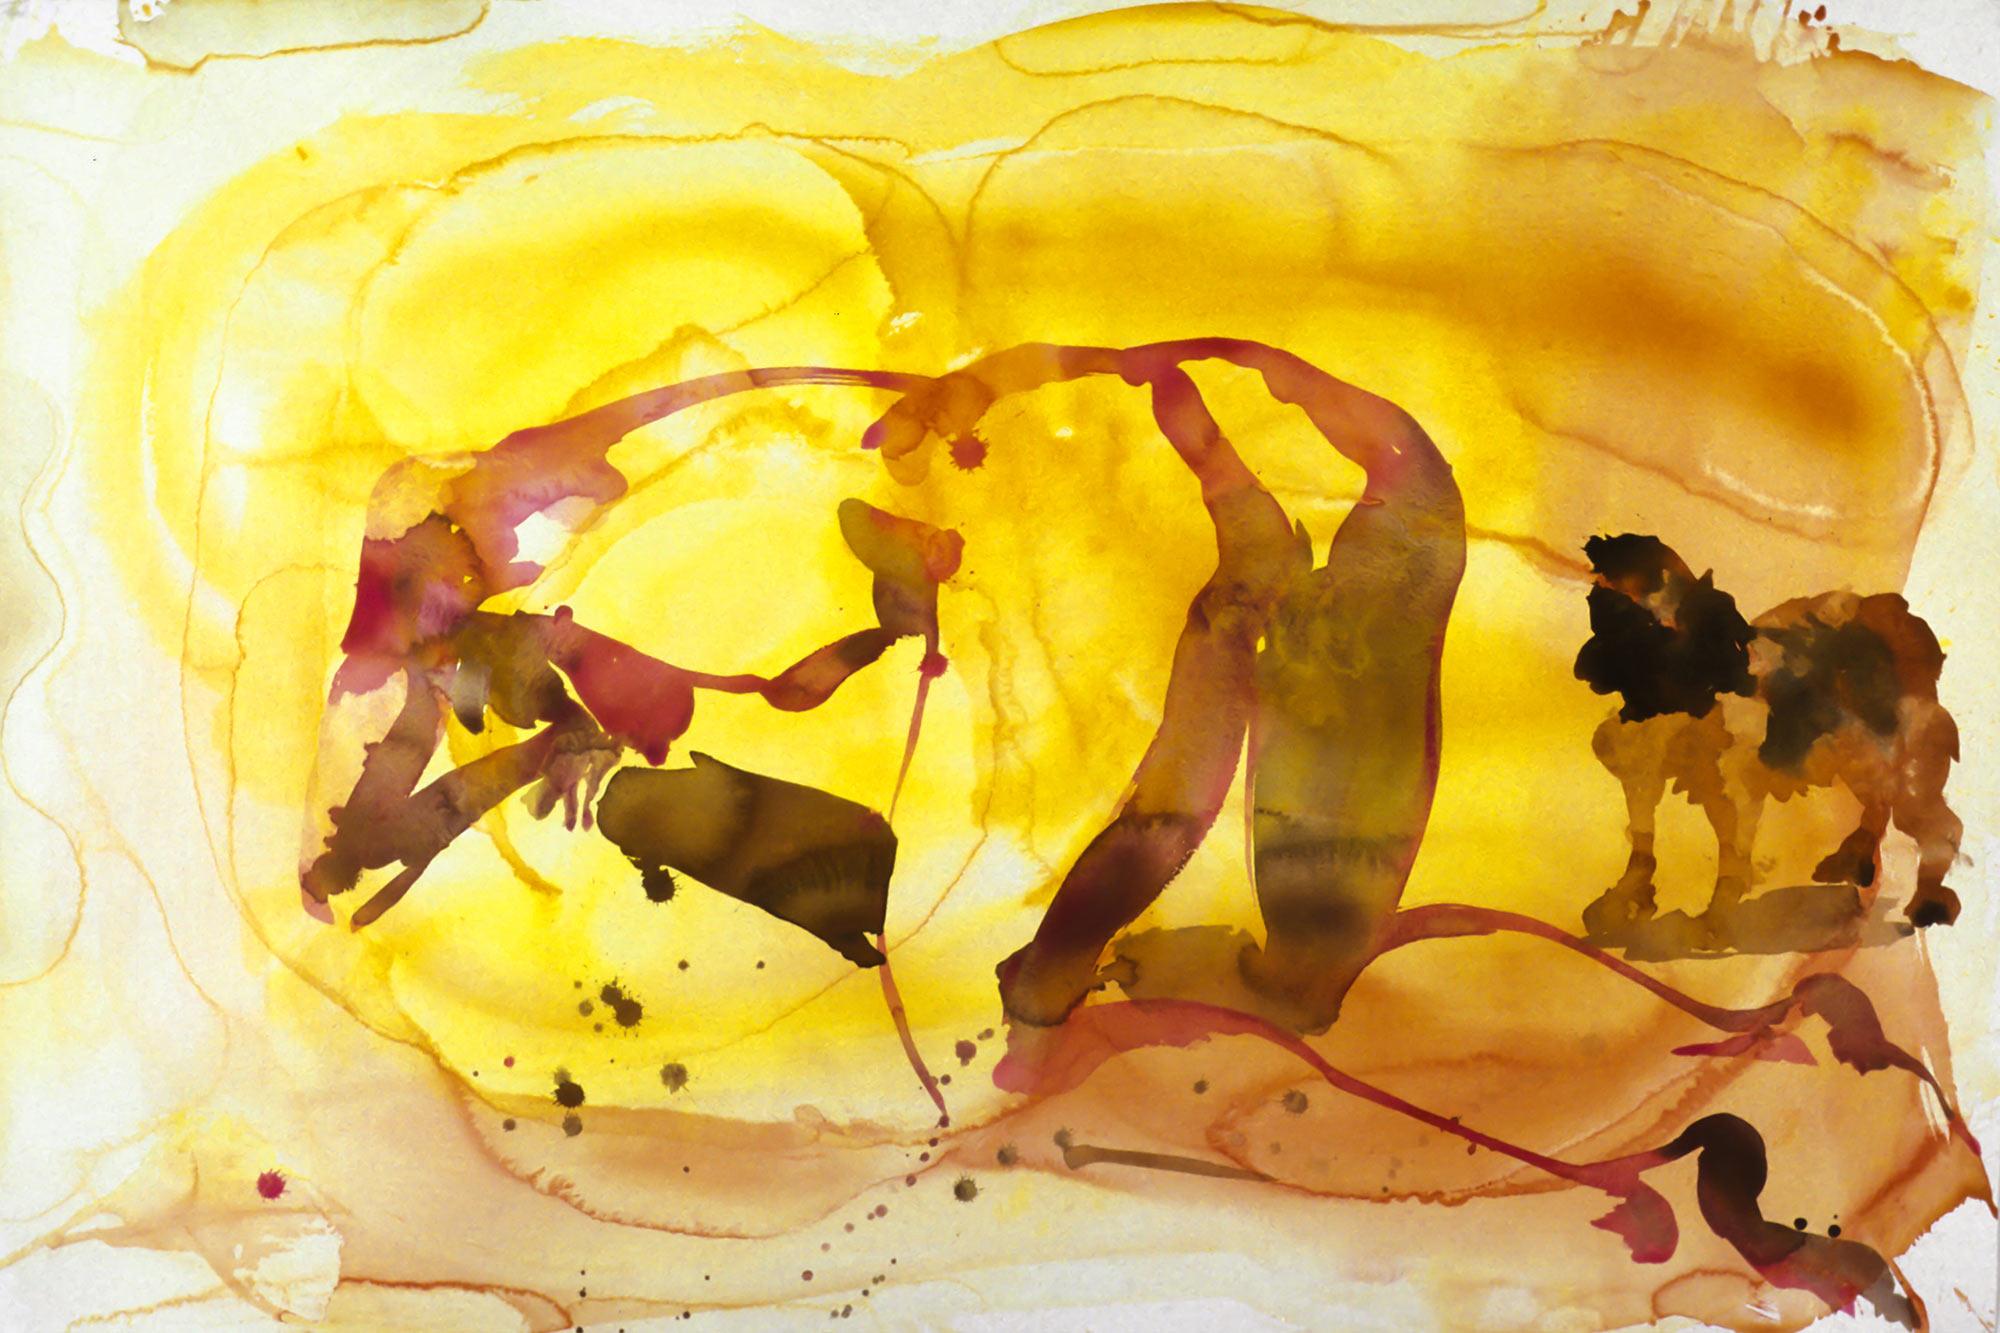 Untitled, 1999.